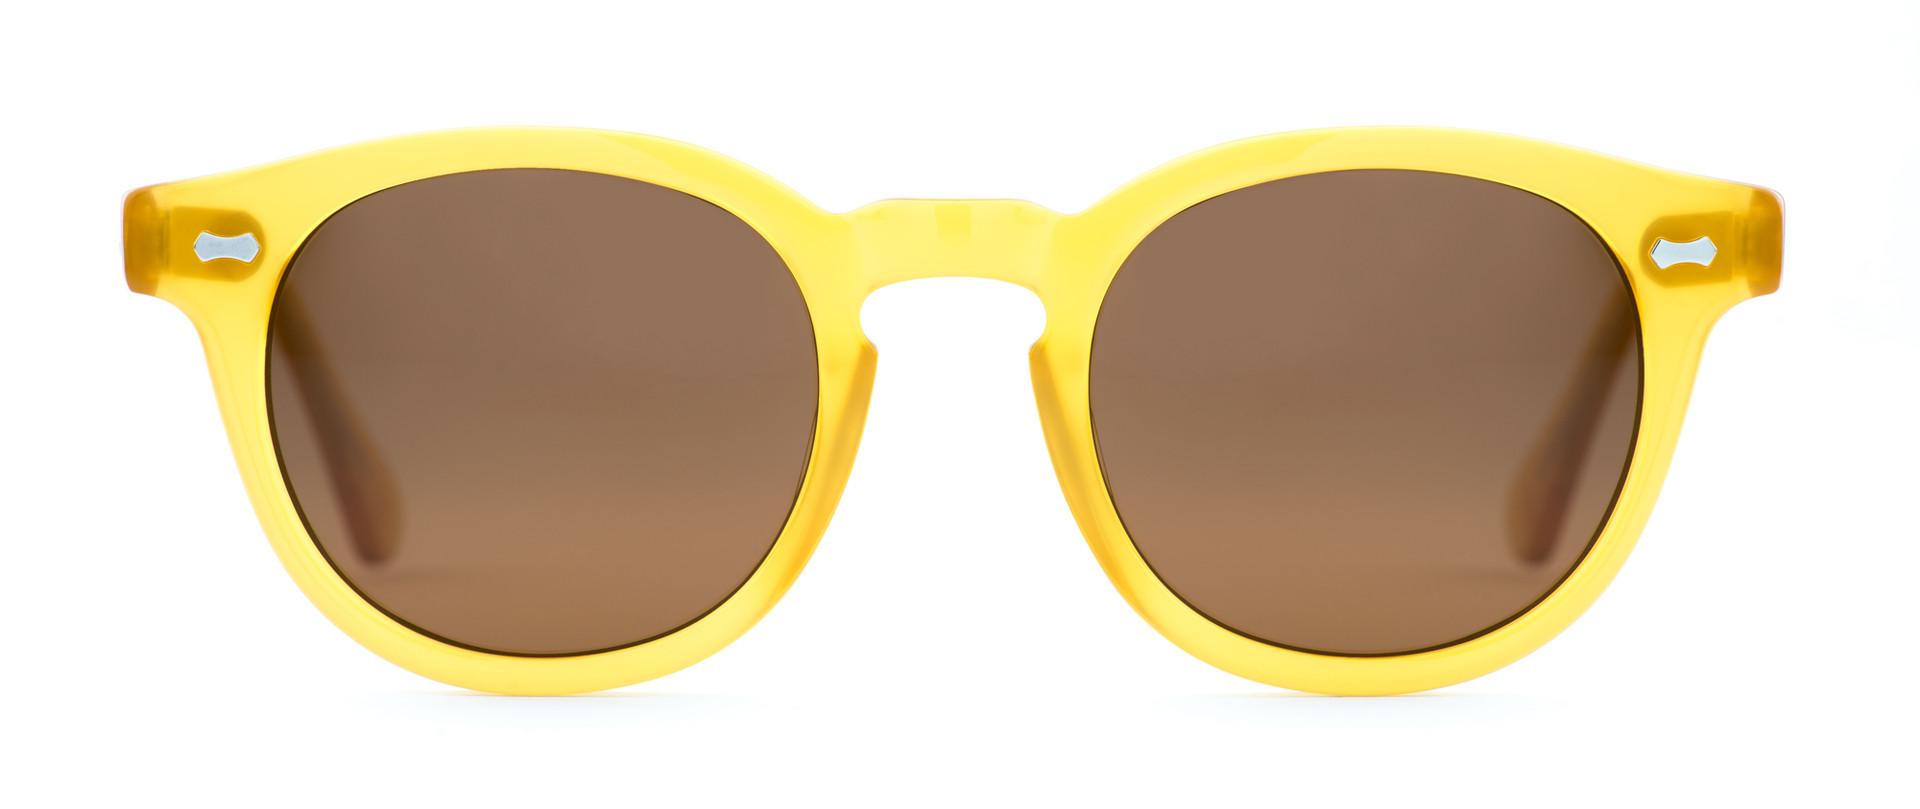 Pelton Woodward Sunglasses